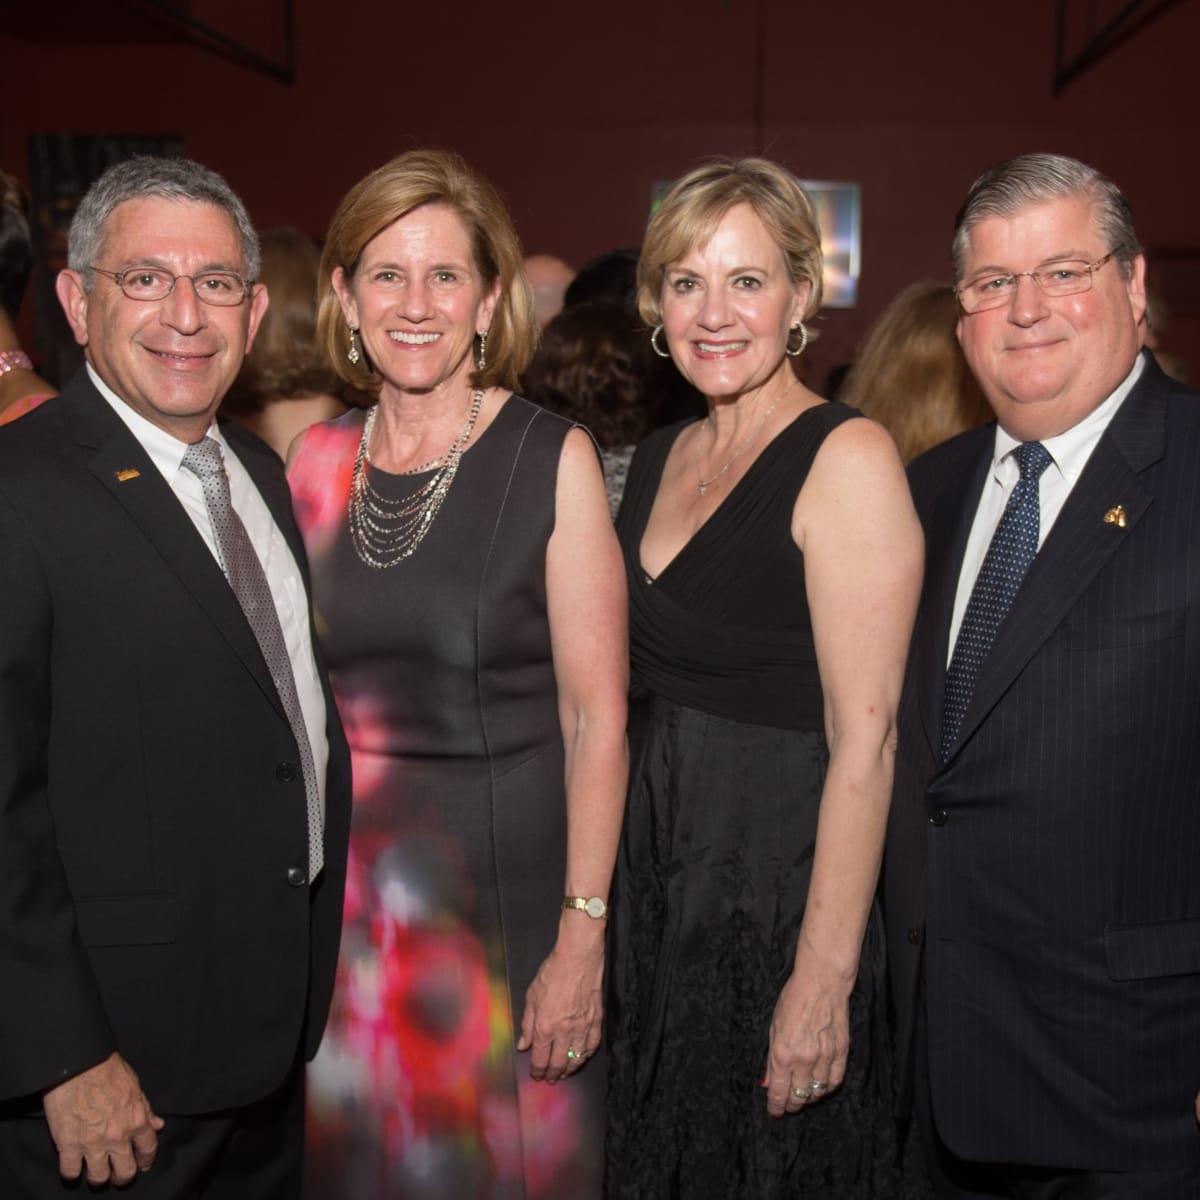 Baylor College of Medicine gala 4/16 Dr. Paul Klotman, Dr. Mary Klotman, Linda Sugarbaker, Dr. David Sugarbaker